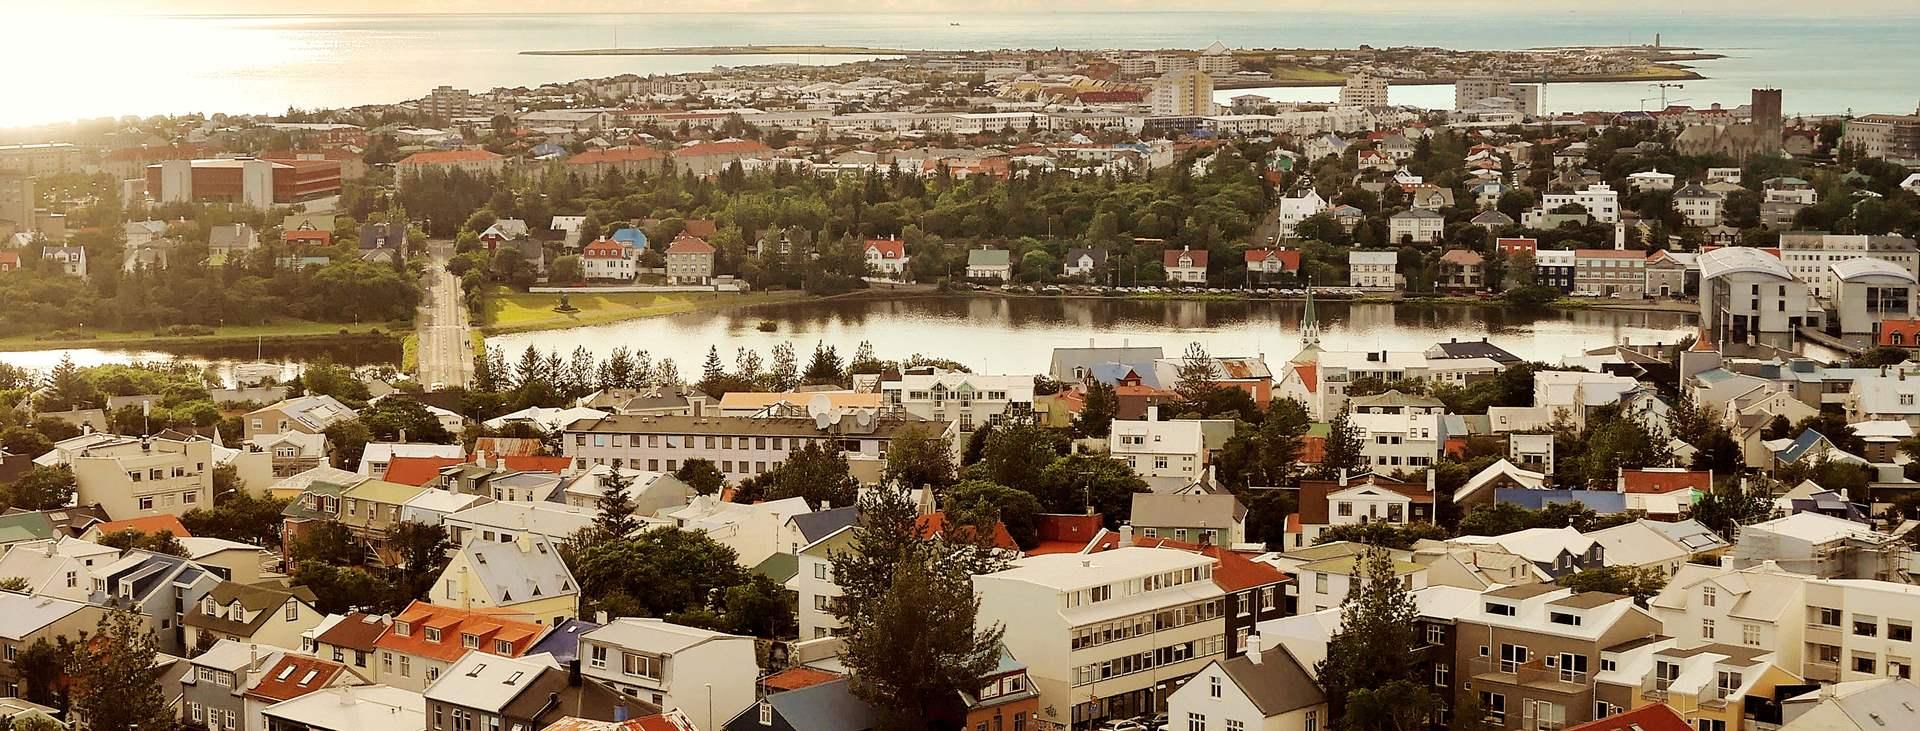 Reis til Reykjavik på Island med Ving